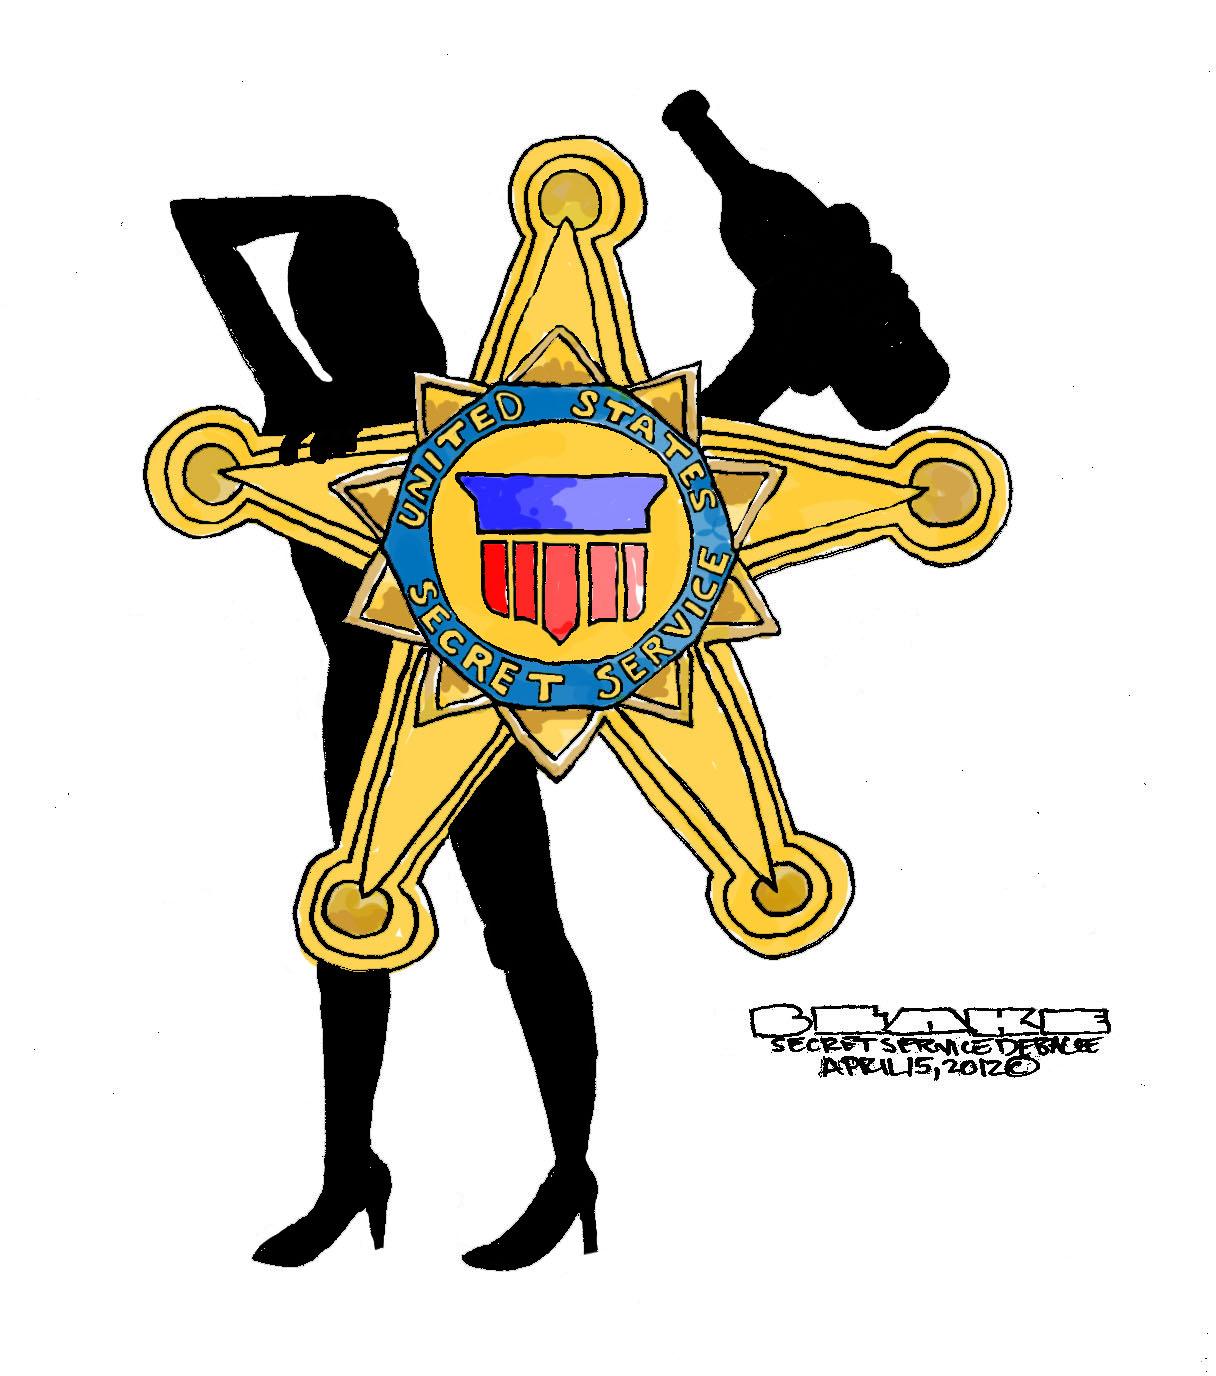 The Proud Badge of the Secret ServiceSecret Service Agents Badge